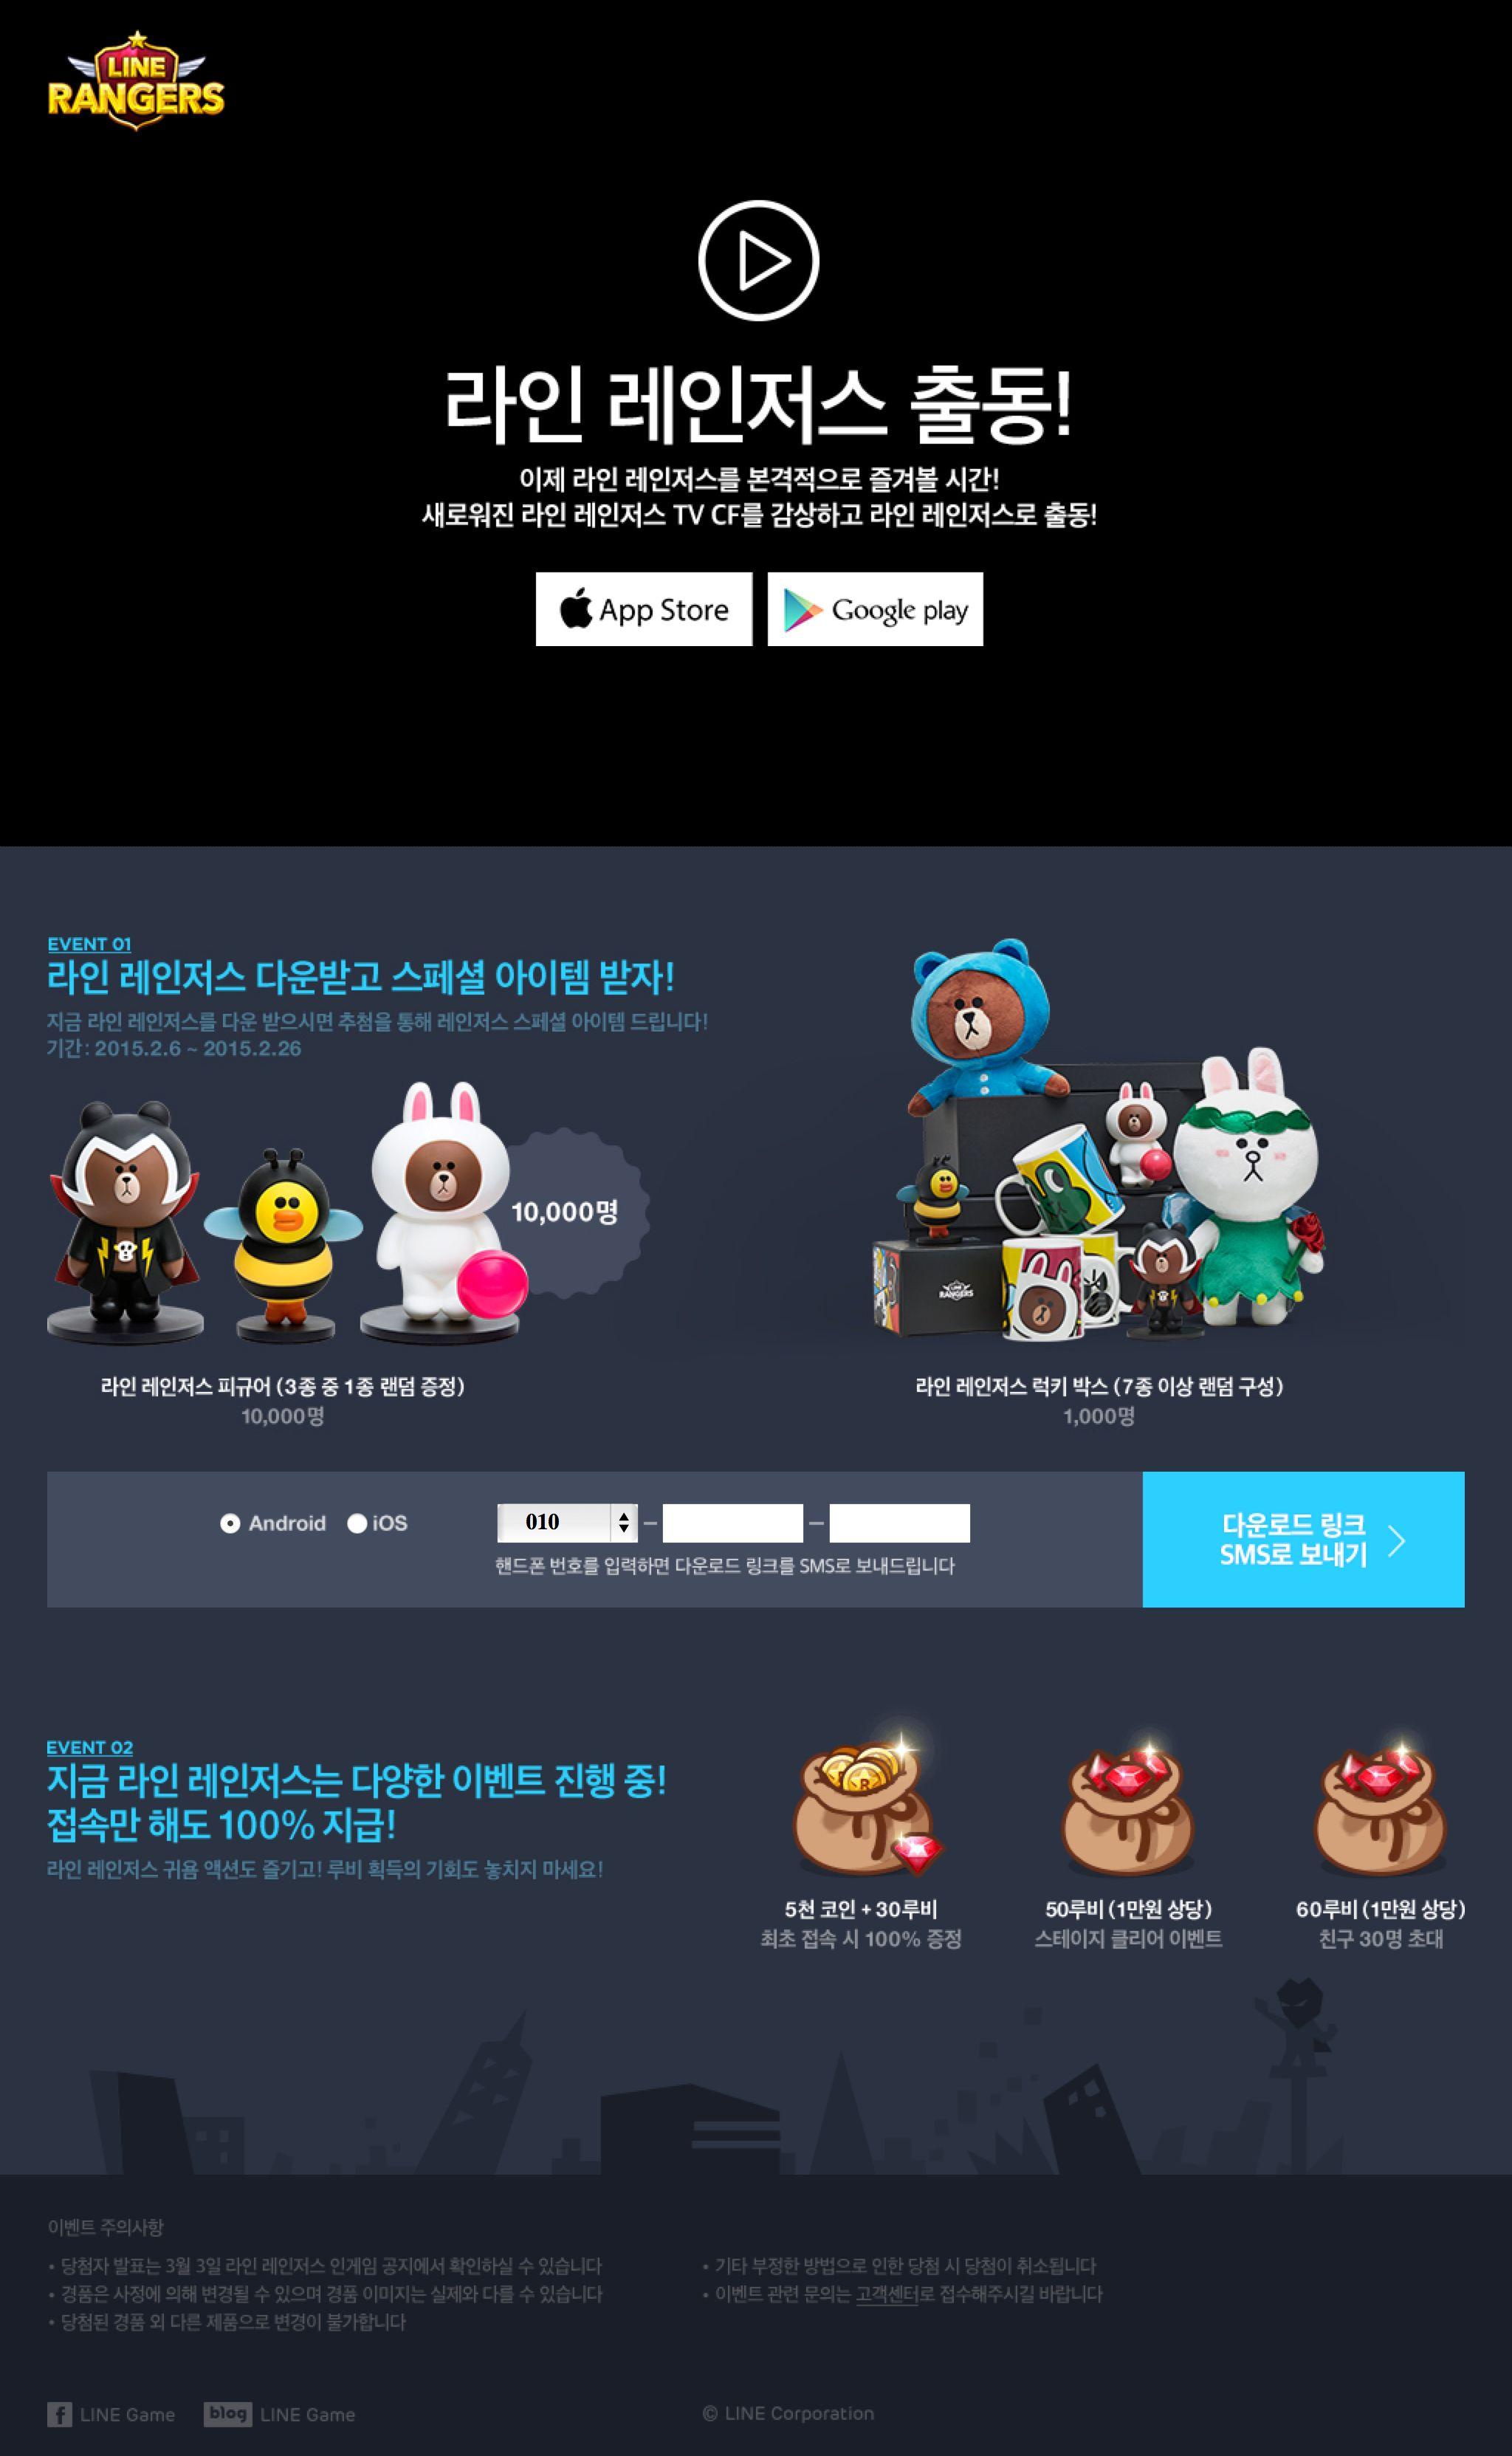 Pin by jja on 프로모션 App store google play, App store